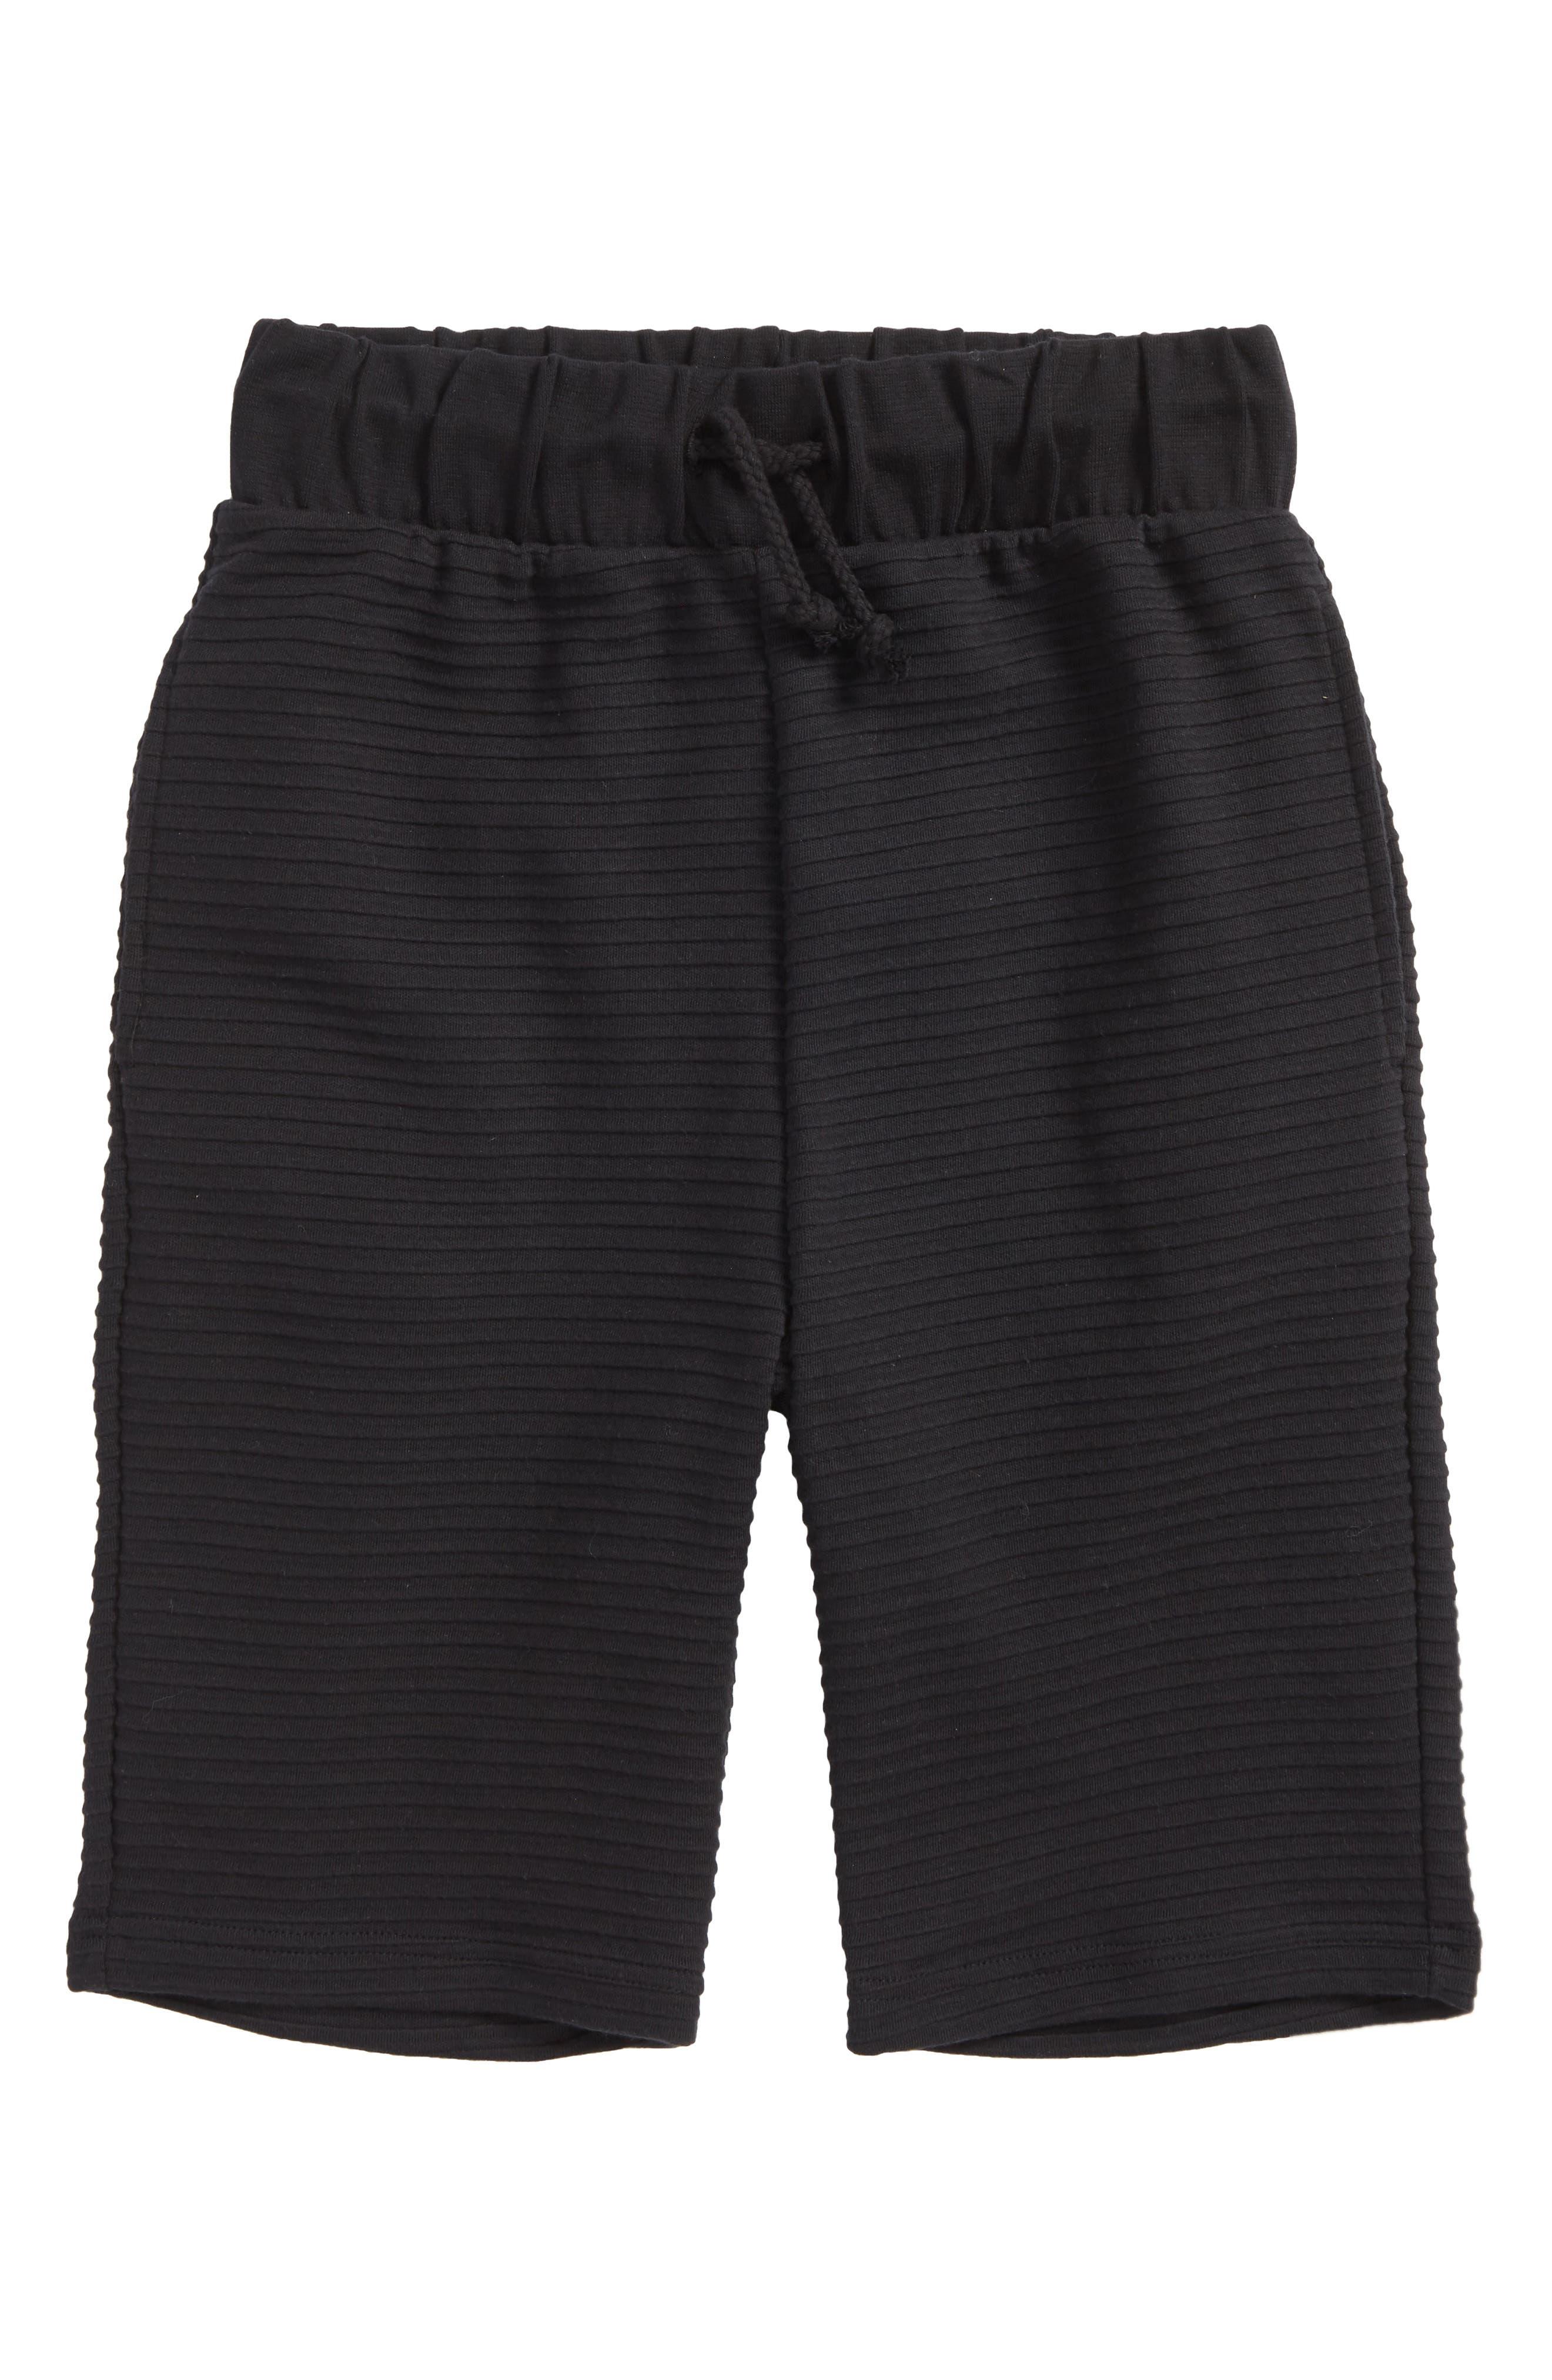 Freddie Knit Shorts,                         Main,                         color, 001